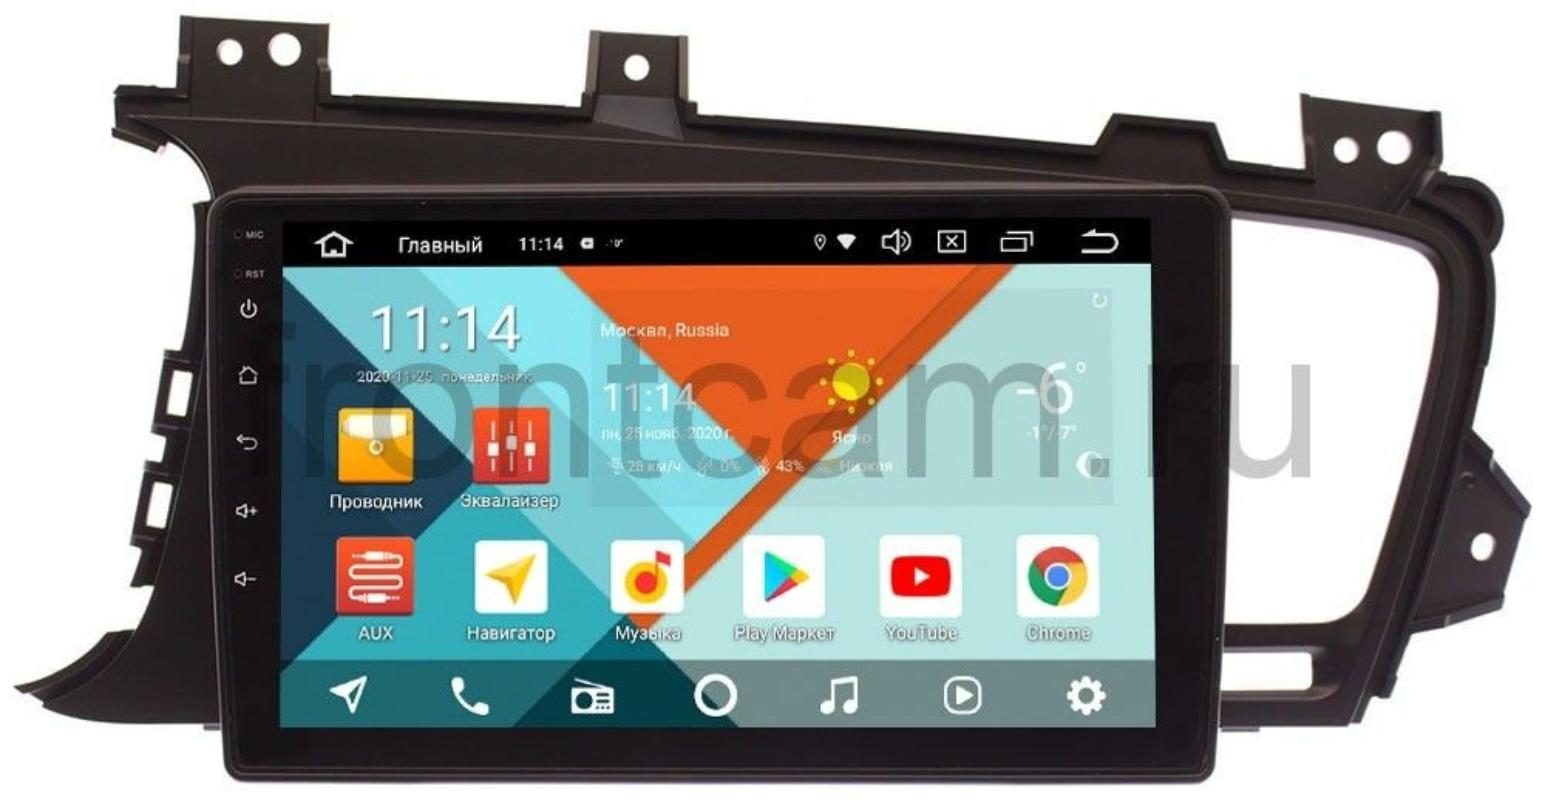 Штатная магнитола Wide Media KS9015QM-2/32 DSP CarPlay 4G-SIM для Kia Optima III 2010-2013 на Android 10 для авто без камеры (+ Камера заднего вида в подарок!)